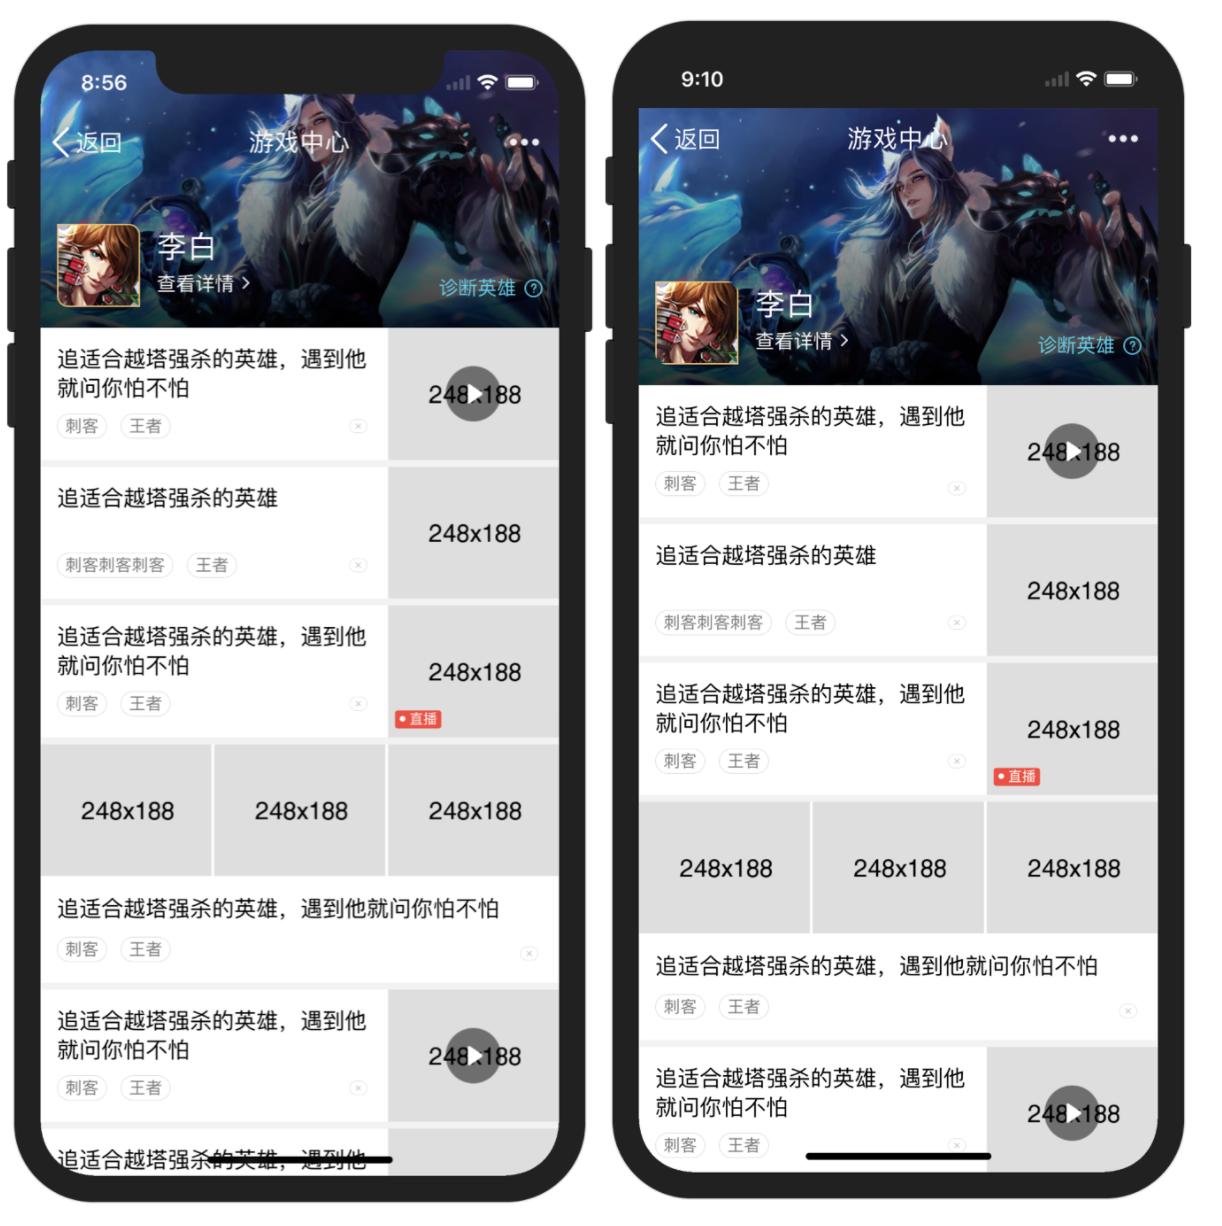 iPhone X的出现给H5页面带来技术革新